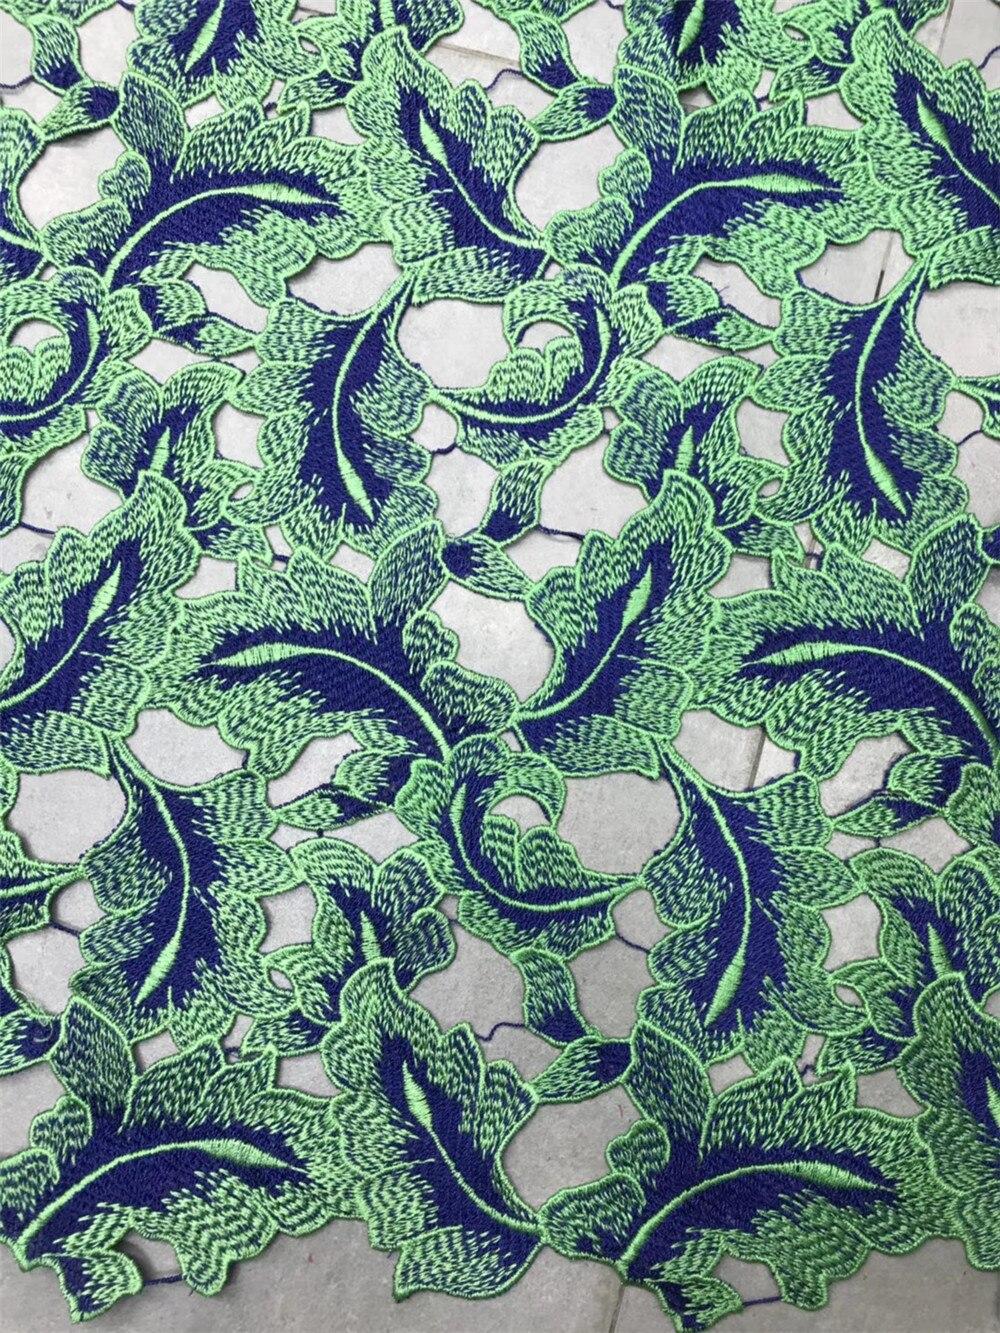 Muti Color Croechet Lace Fabric For Fashion  Dress